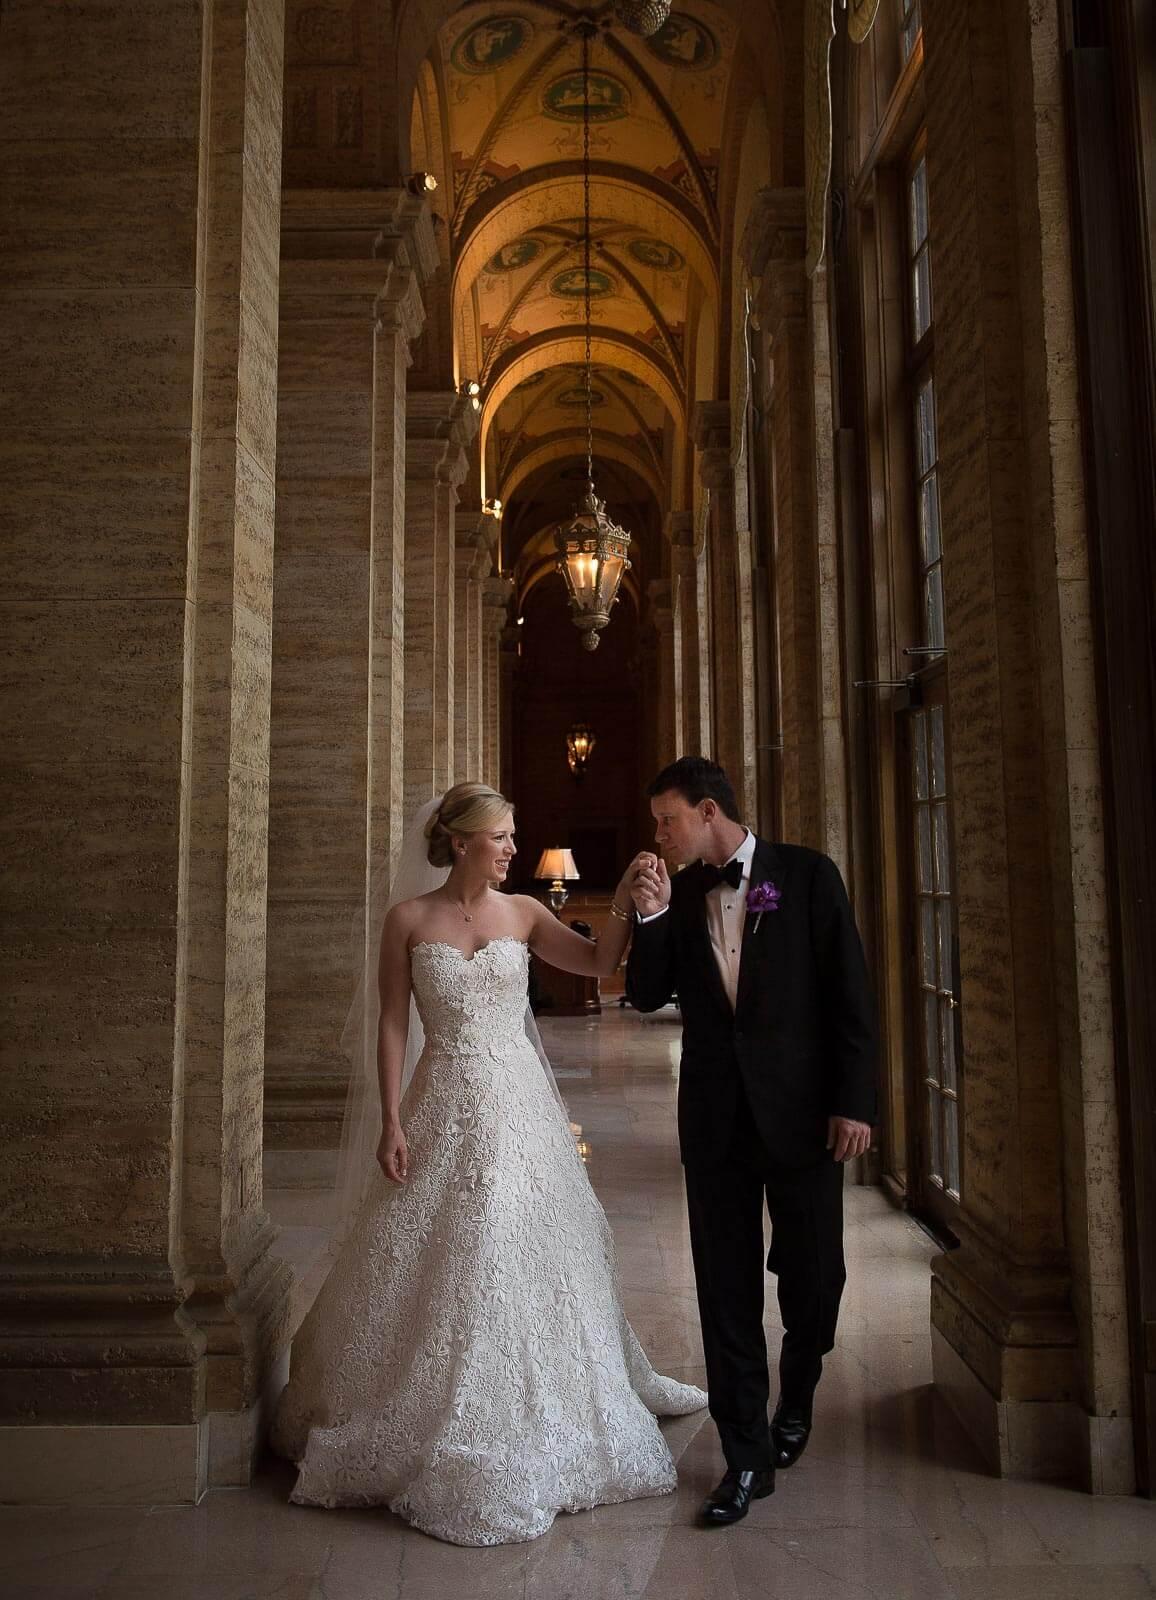 Morgan Pressel's Luxurious Breakers Hotel Wedding